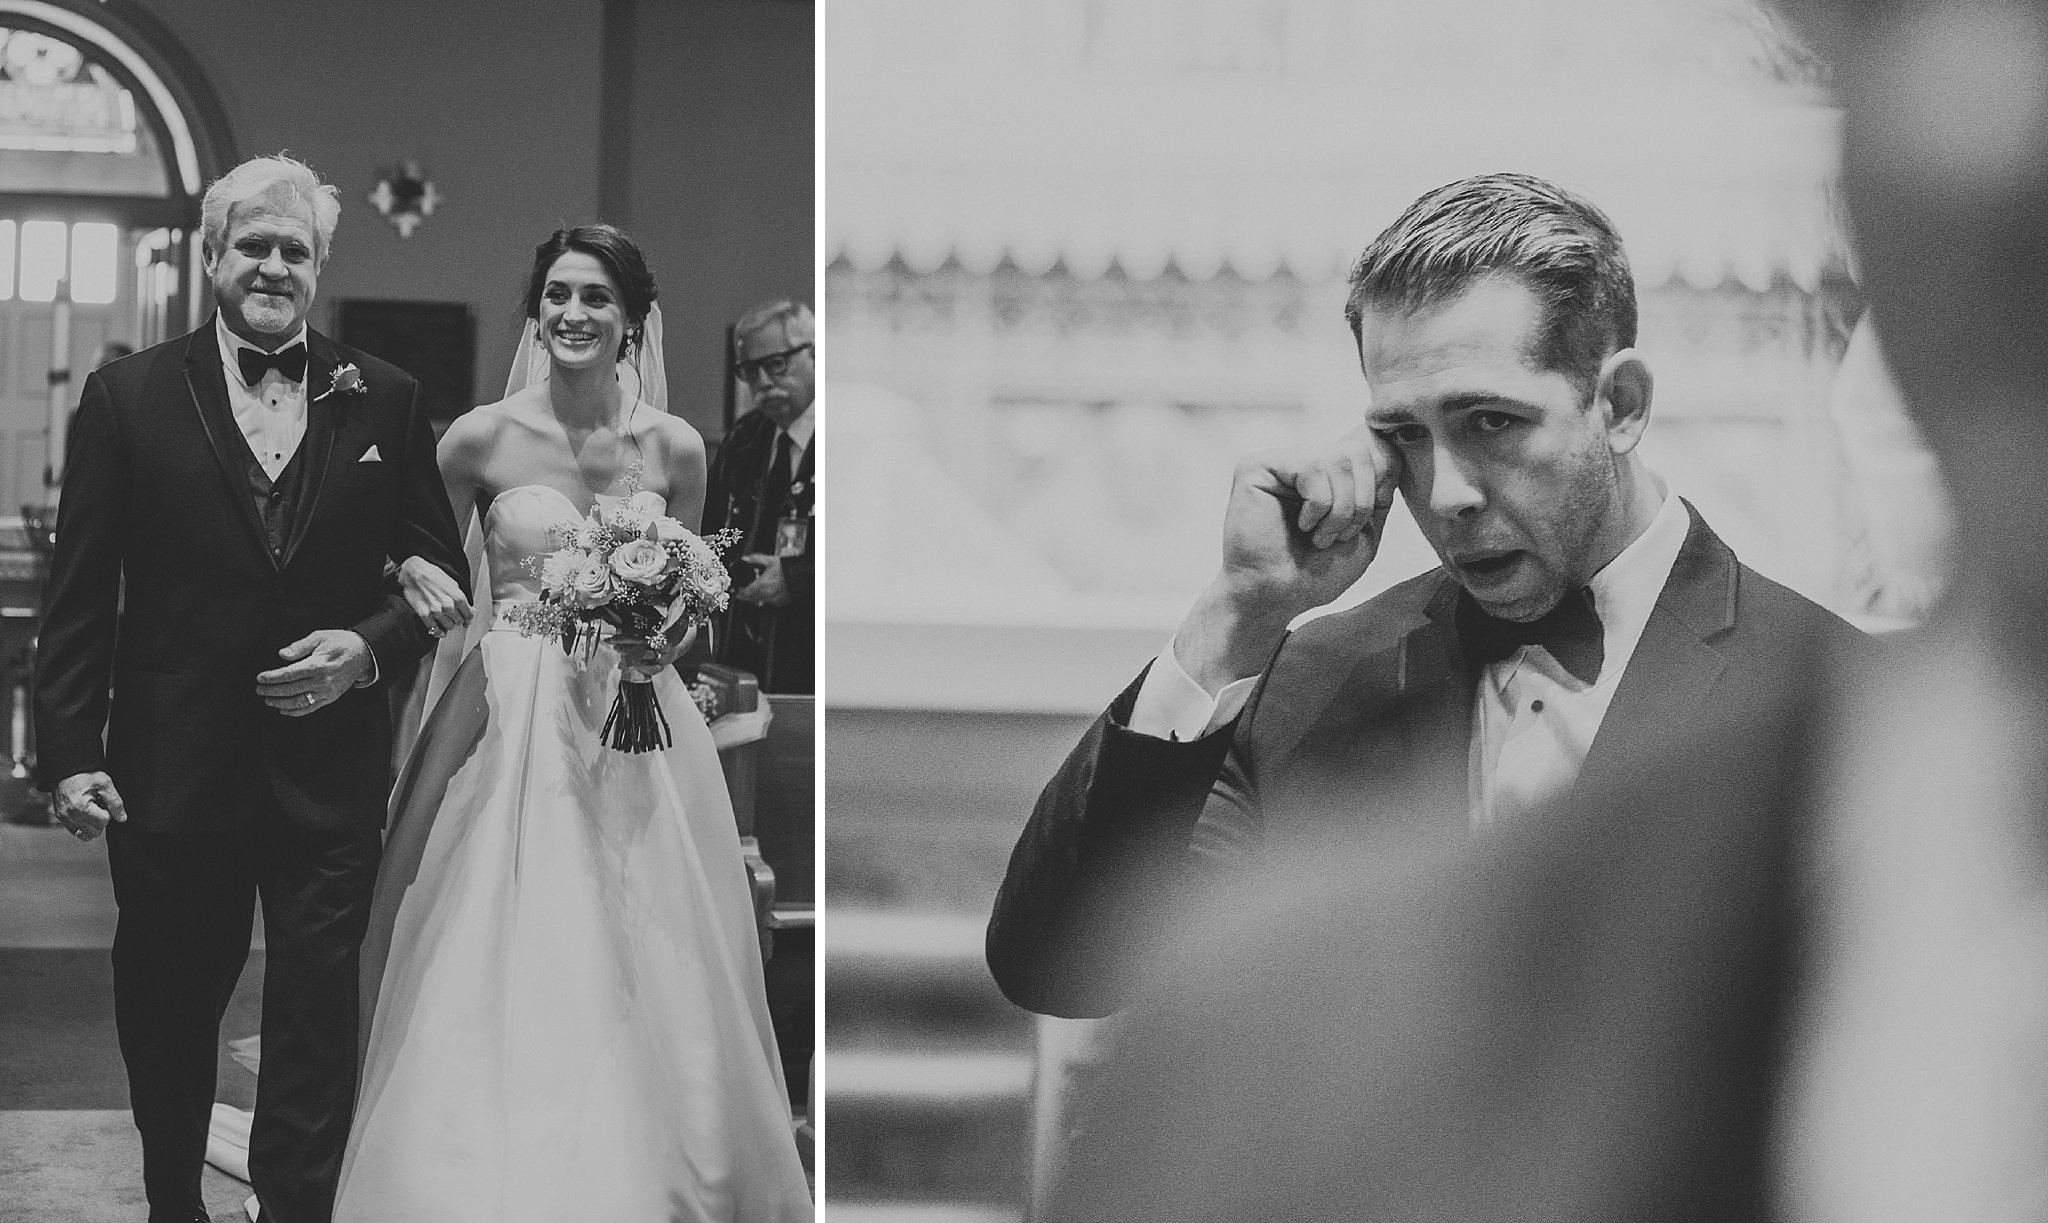 Matt-Lauren_St-Marys_Hilton-City-Center-Milwaukee-Wedding_liller-photo_0015.jpg